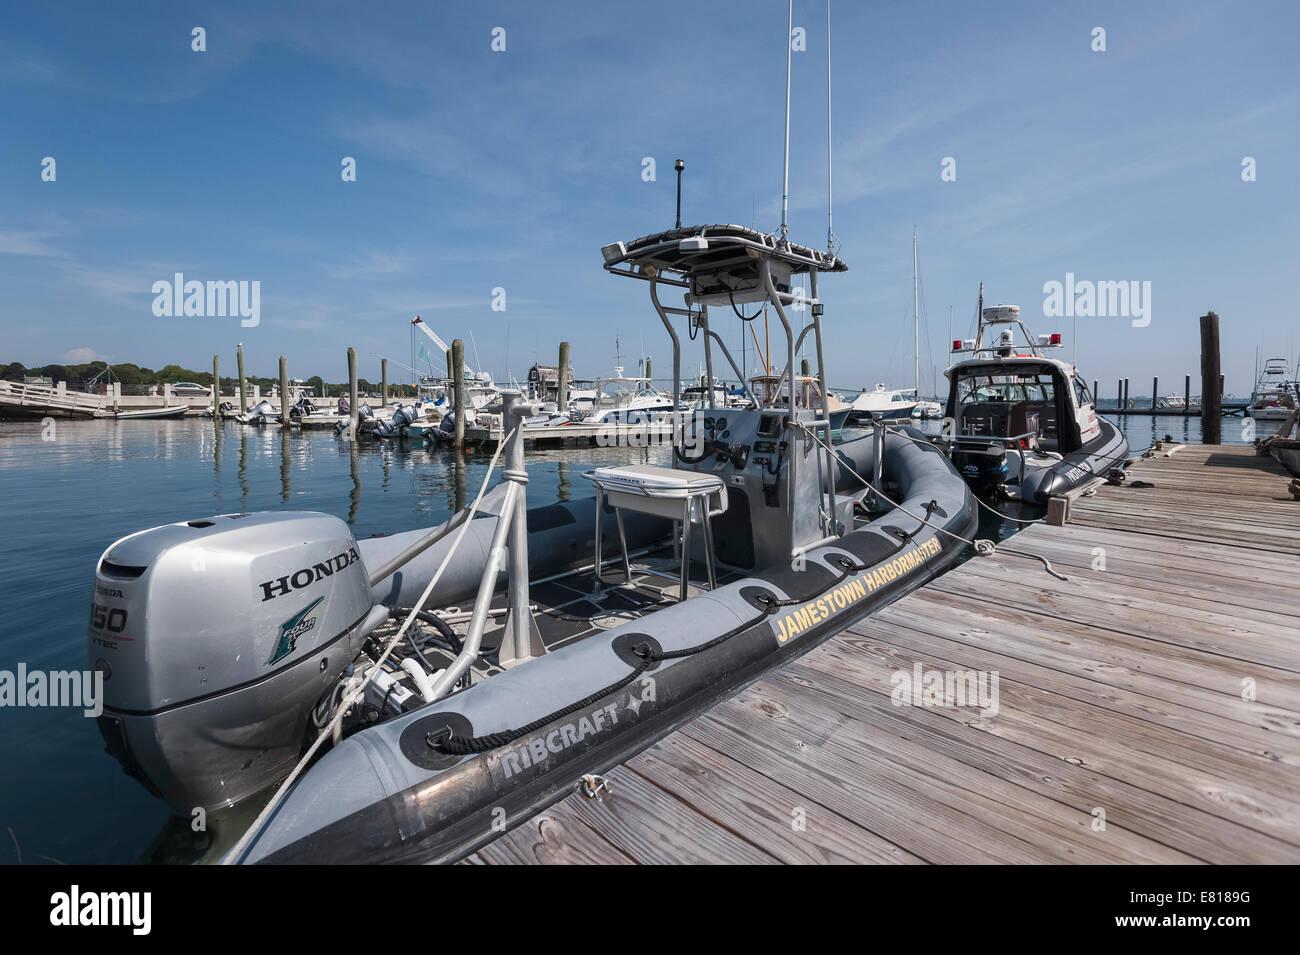 Jamestown Rhode Island USA Harbormaster moored at dockside. - Stock Image